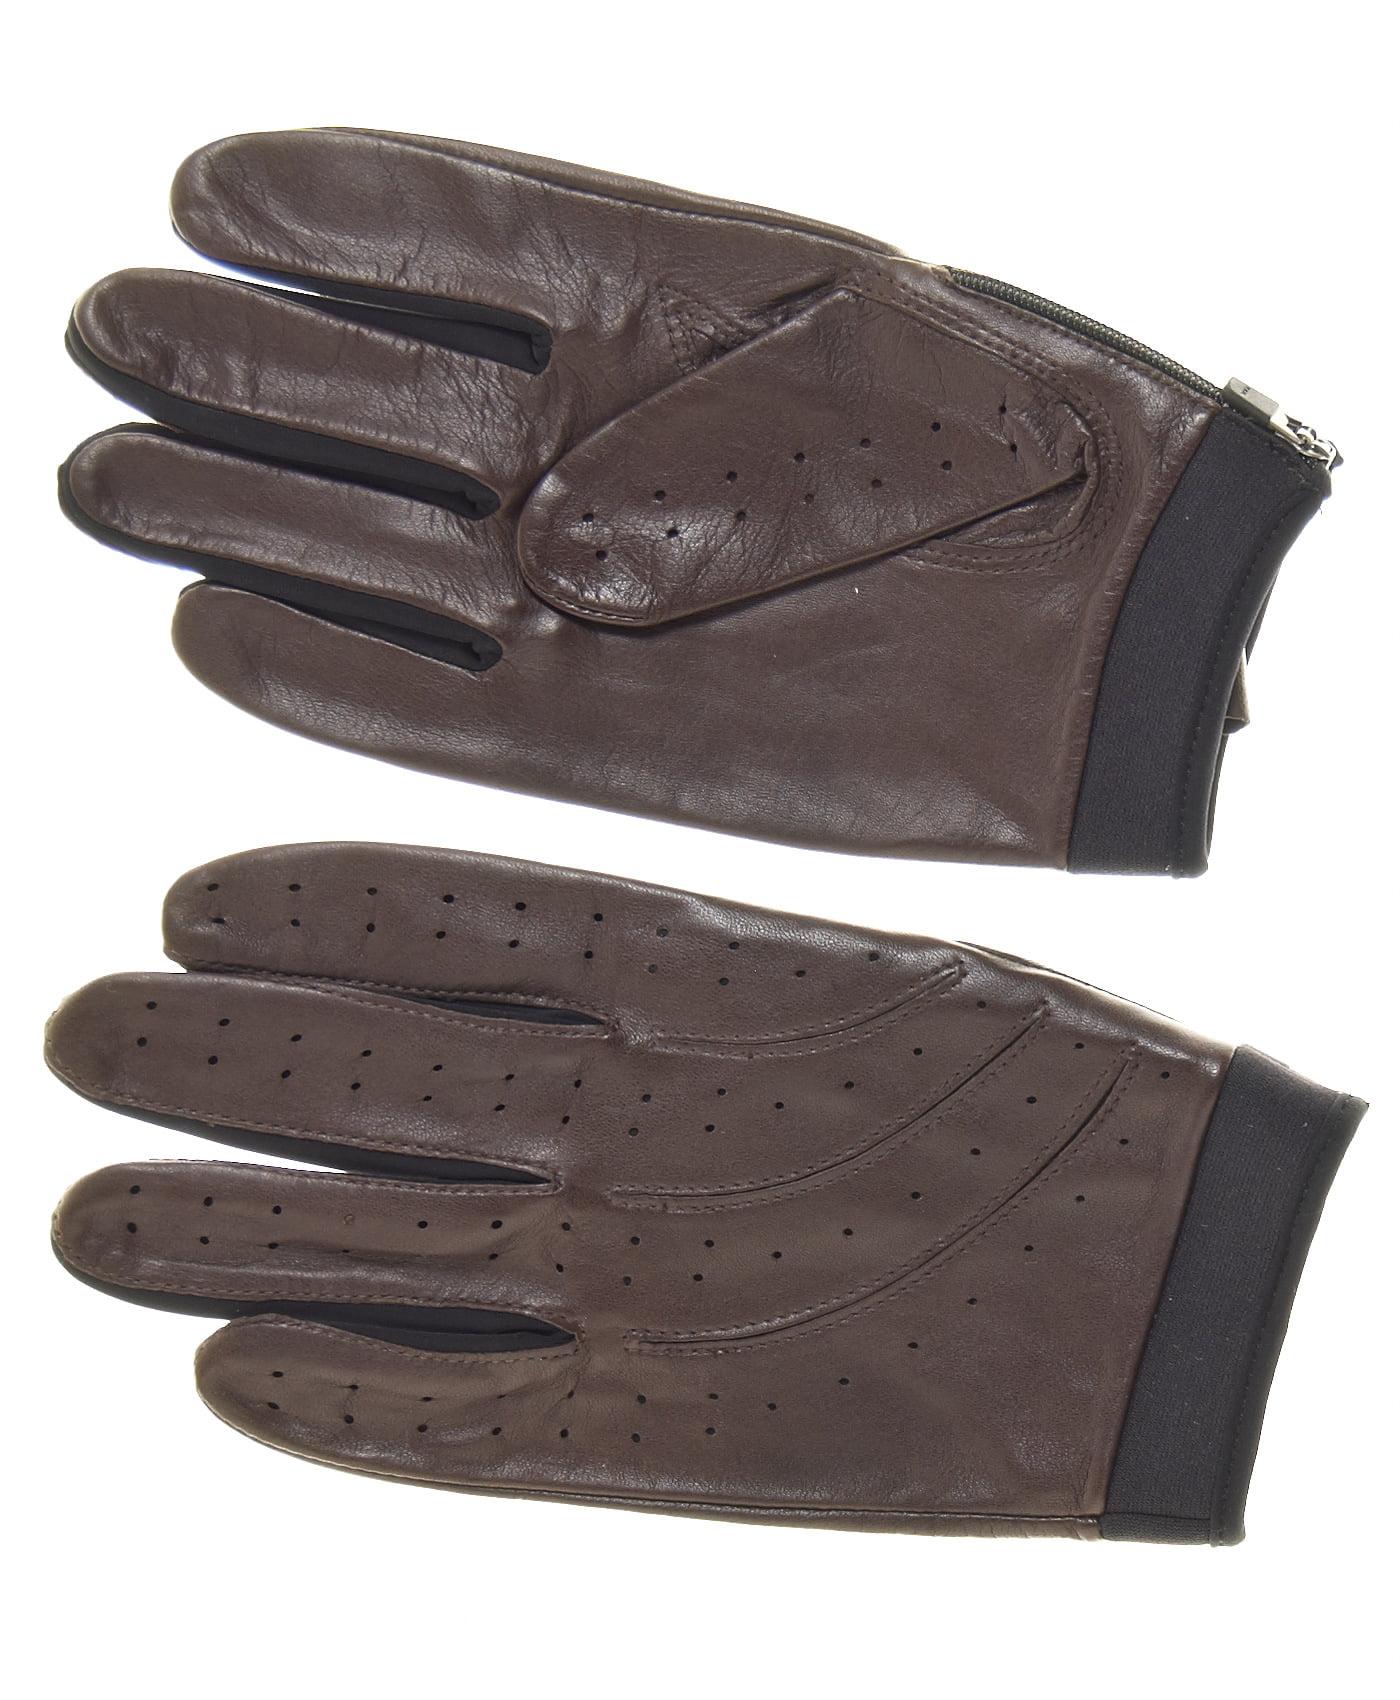 Driving gloves at walmart - Pratt And Hart Men S Hugger Leather Lycra Driving Gloves